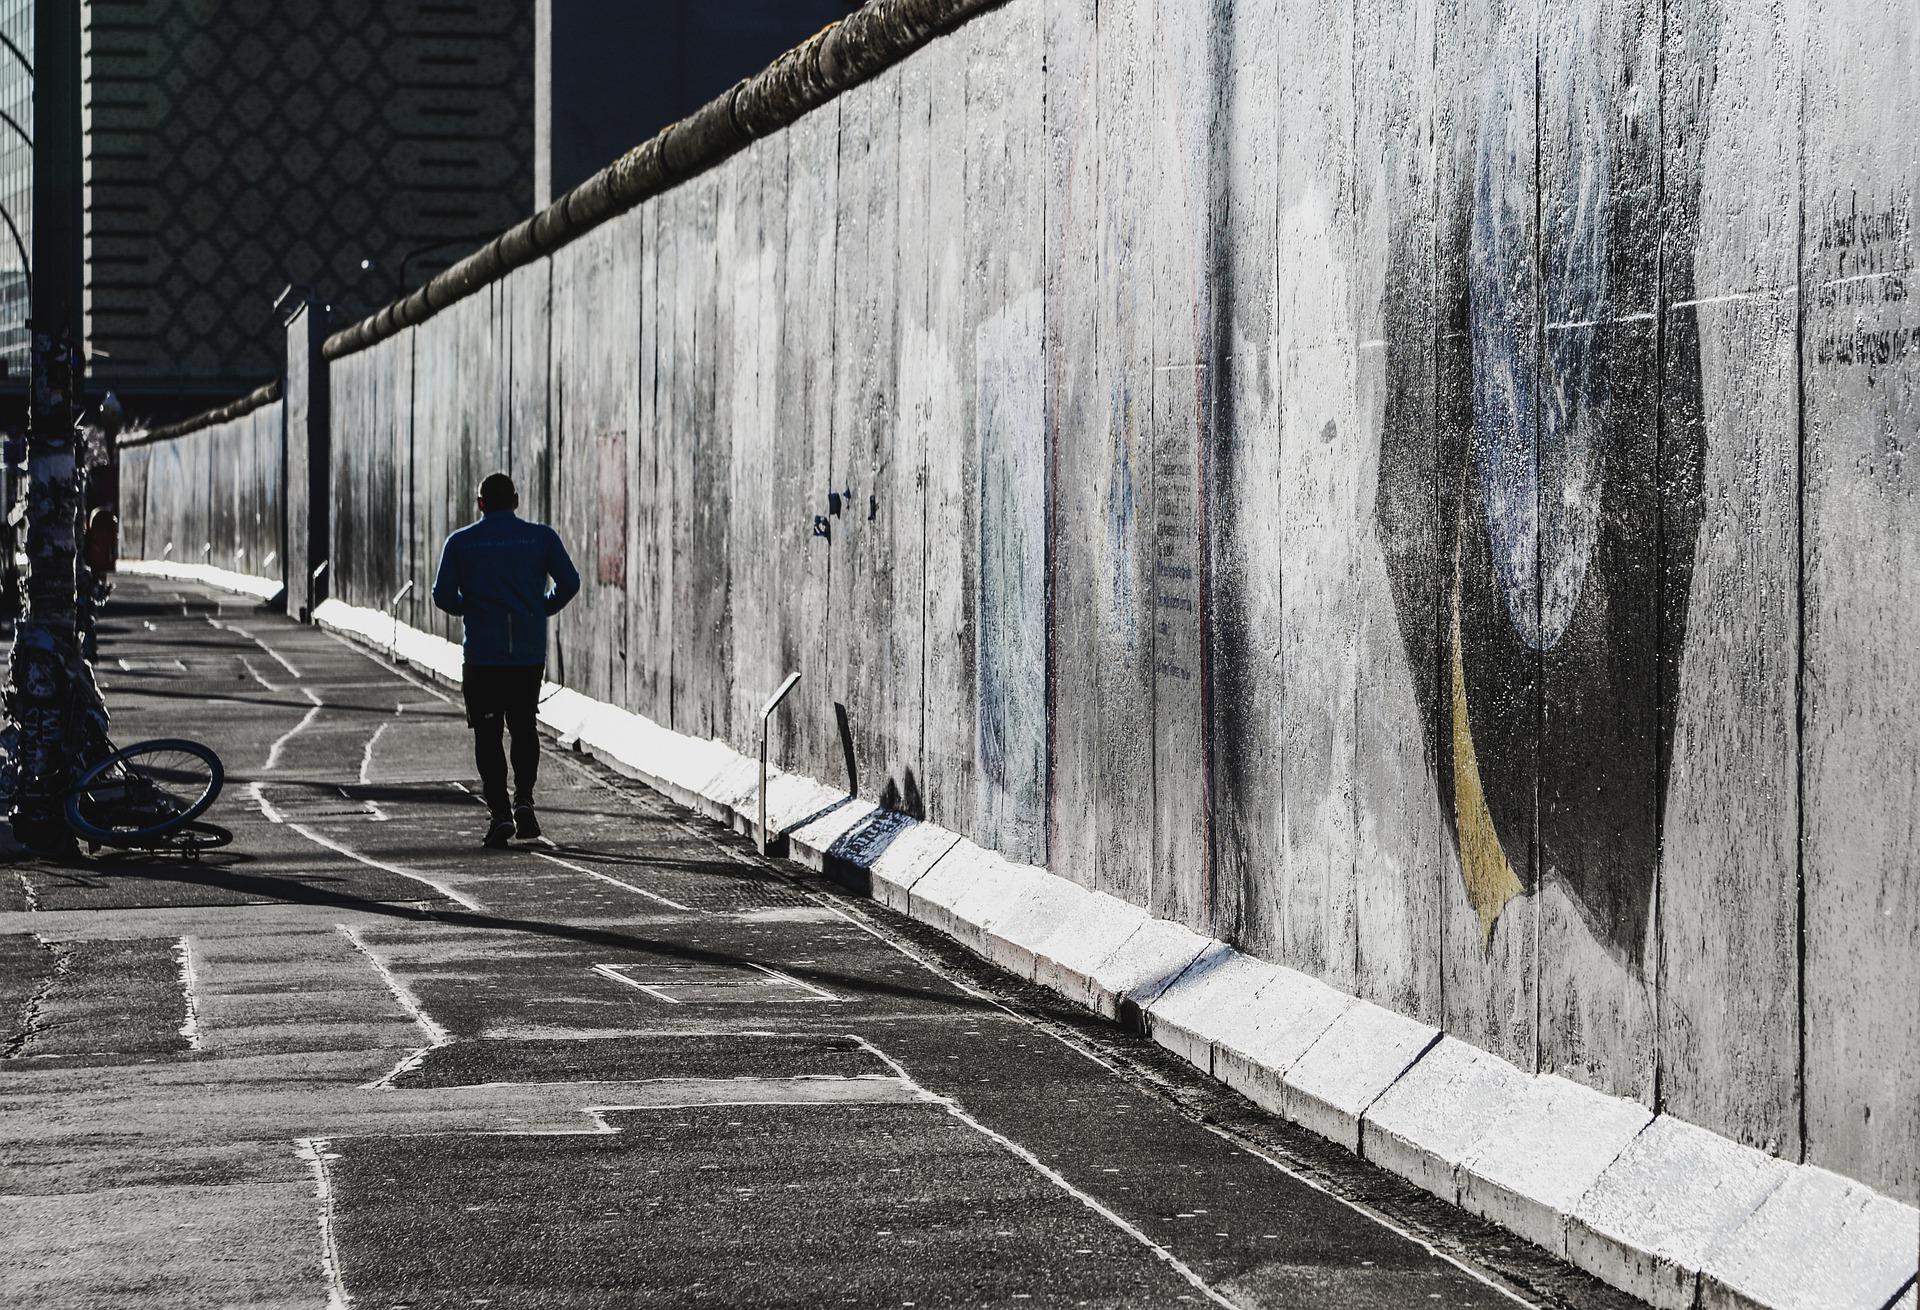 Pared del Muro de Berlín